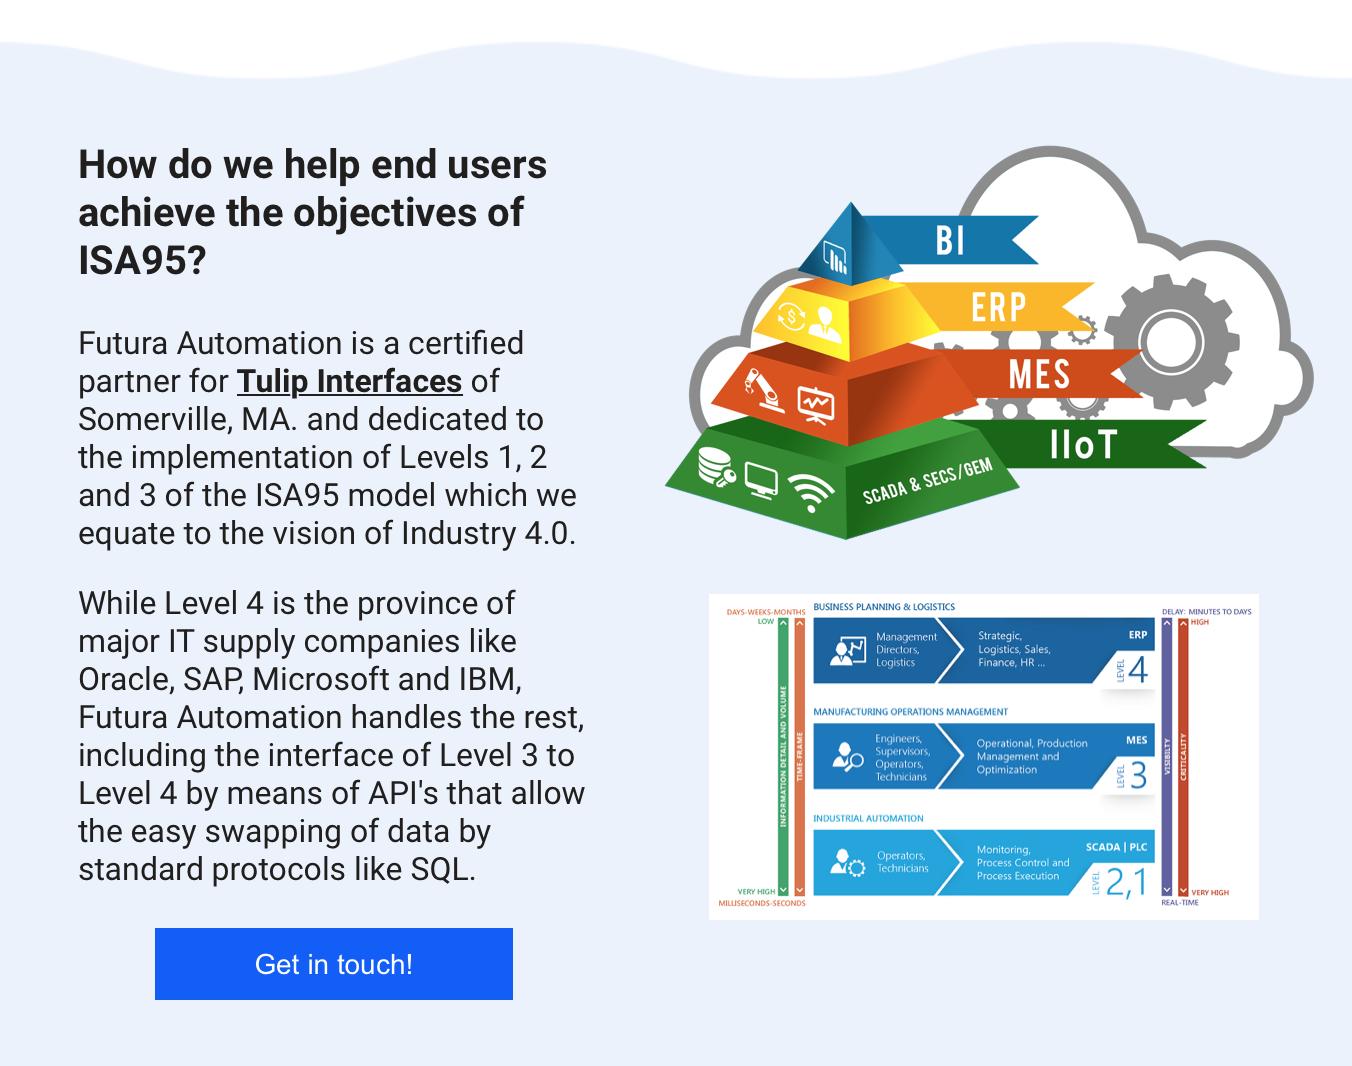 Futura Automation Industry 4.0